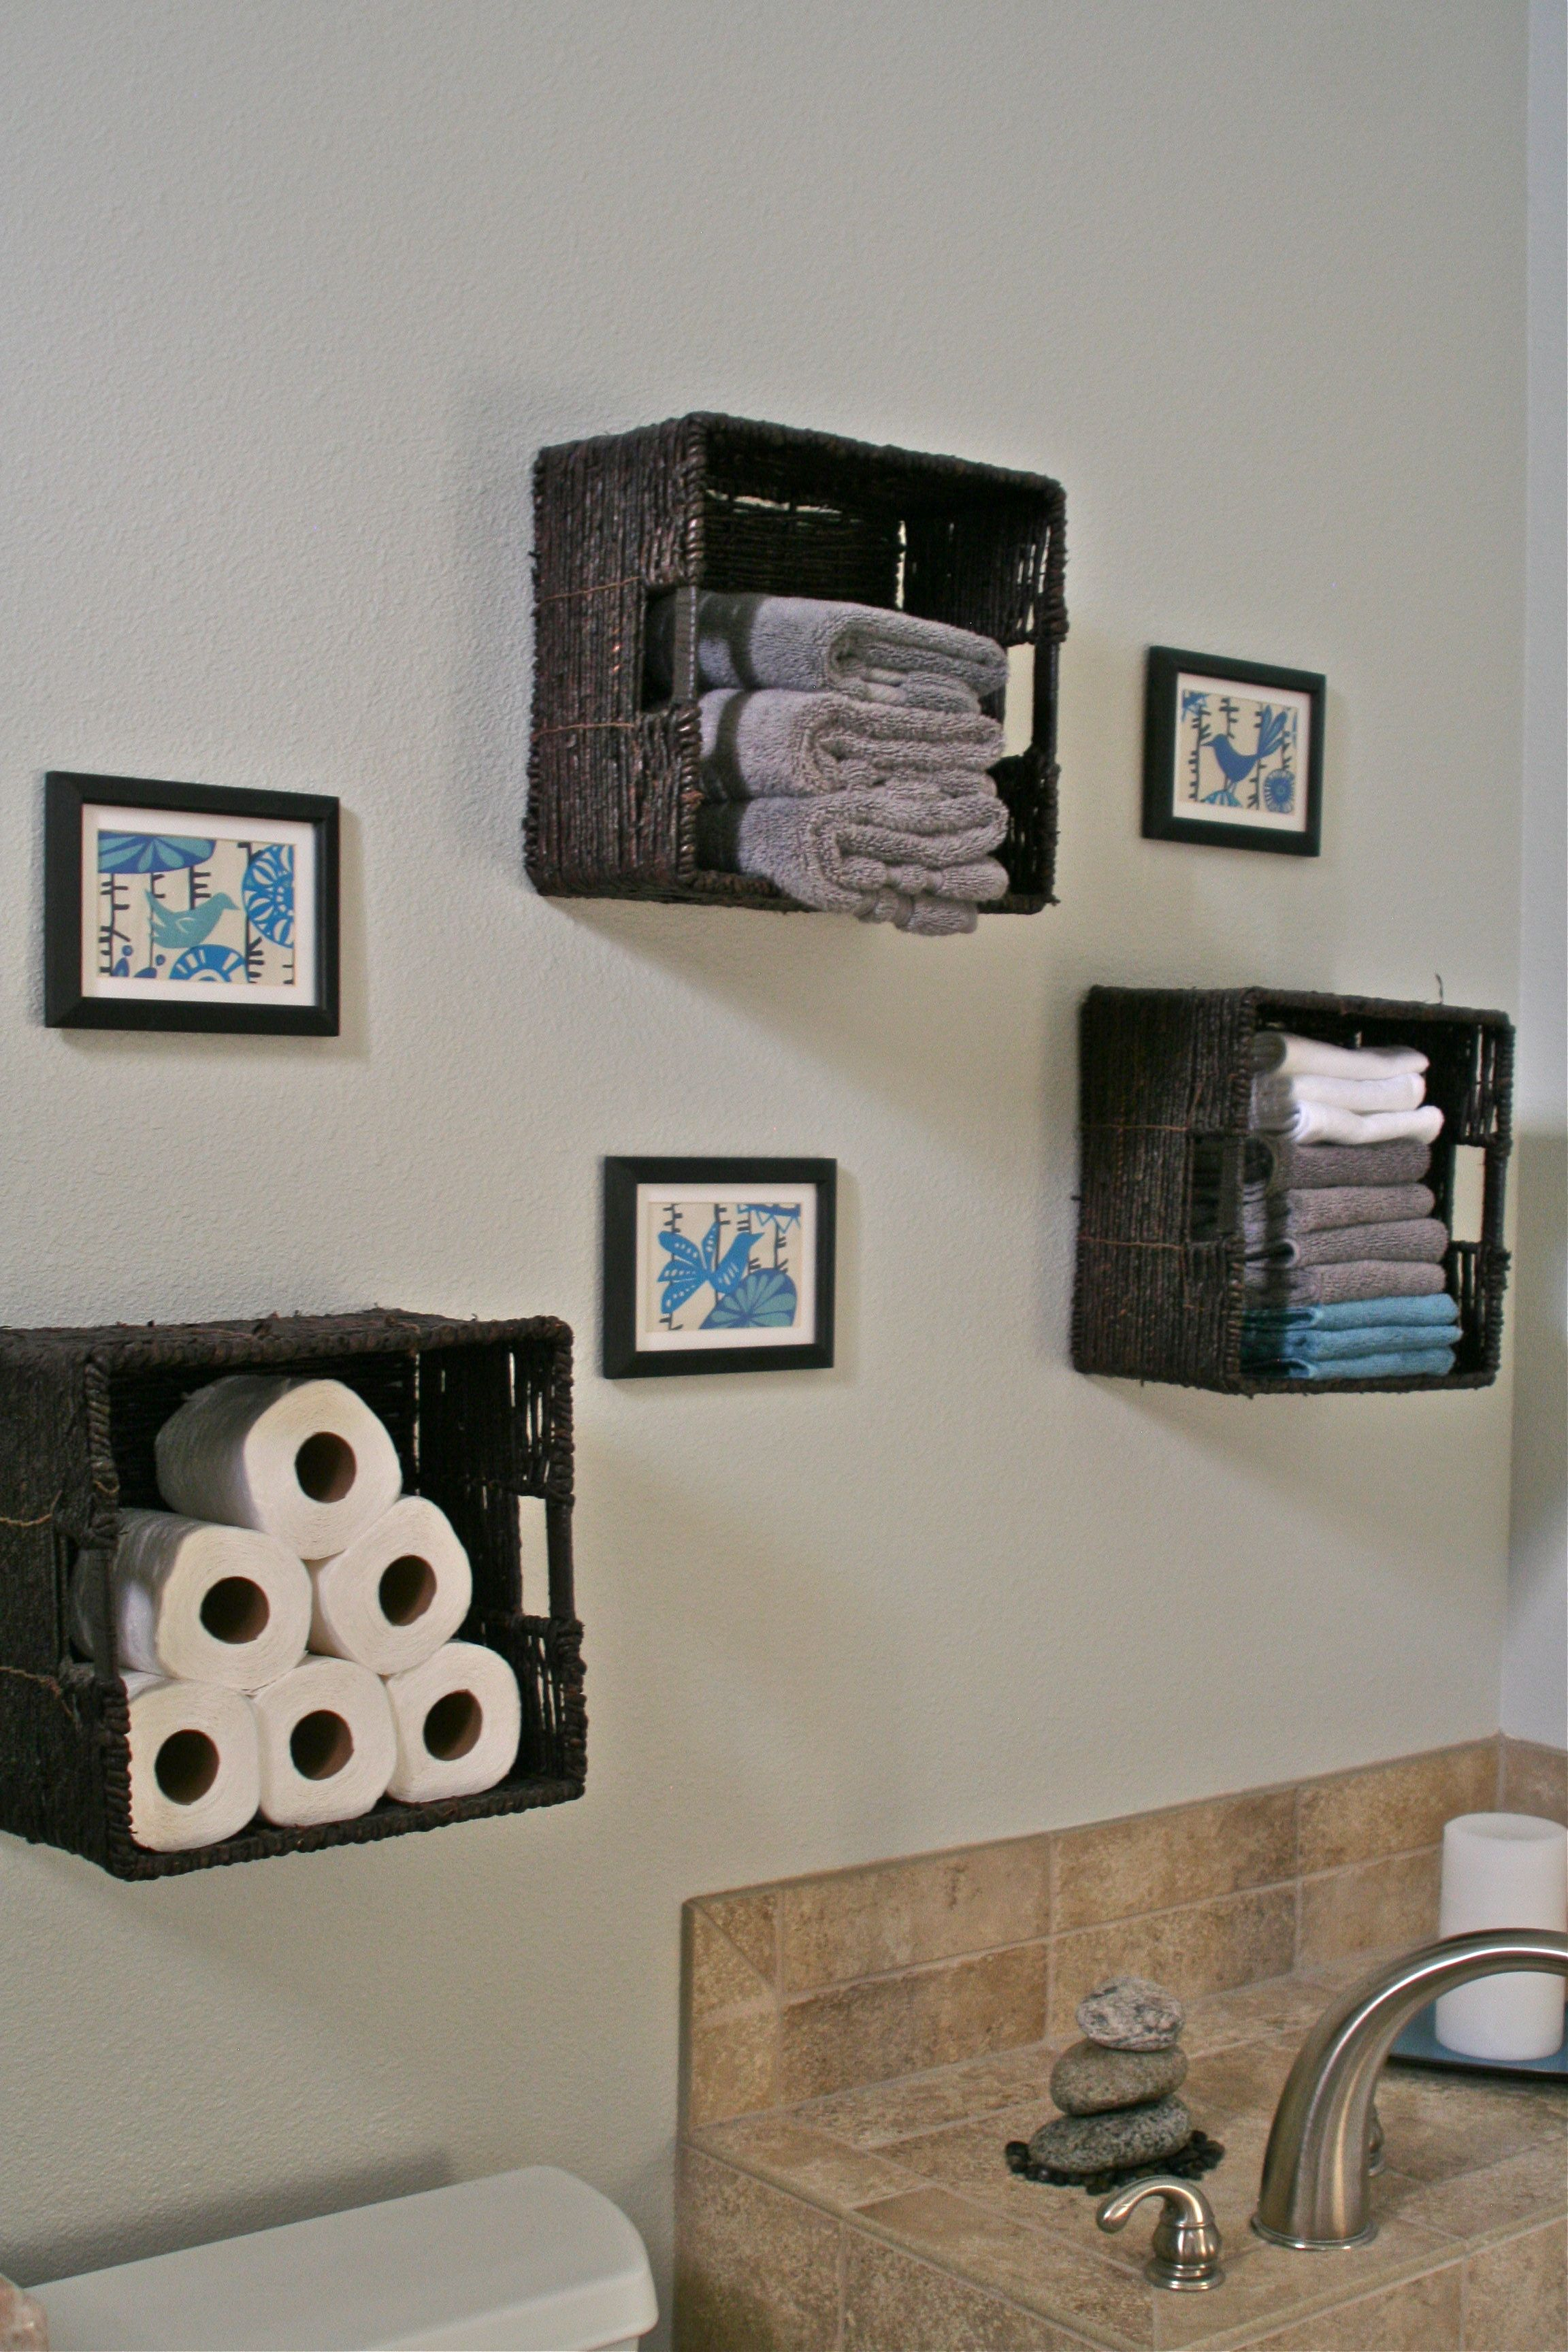 Bathroom Storage Baskets For Towels Toilet Paper Etc Love regarding dimensions 2304 X 3456